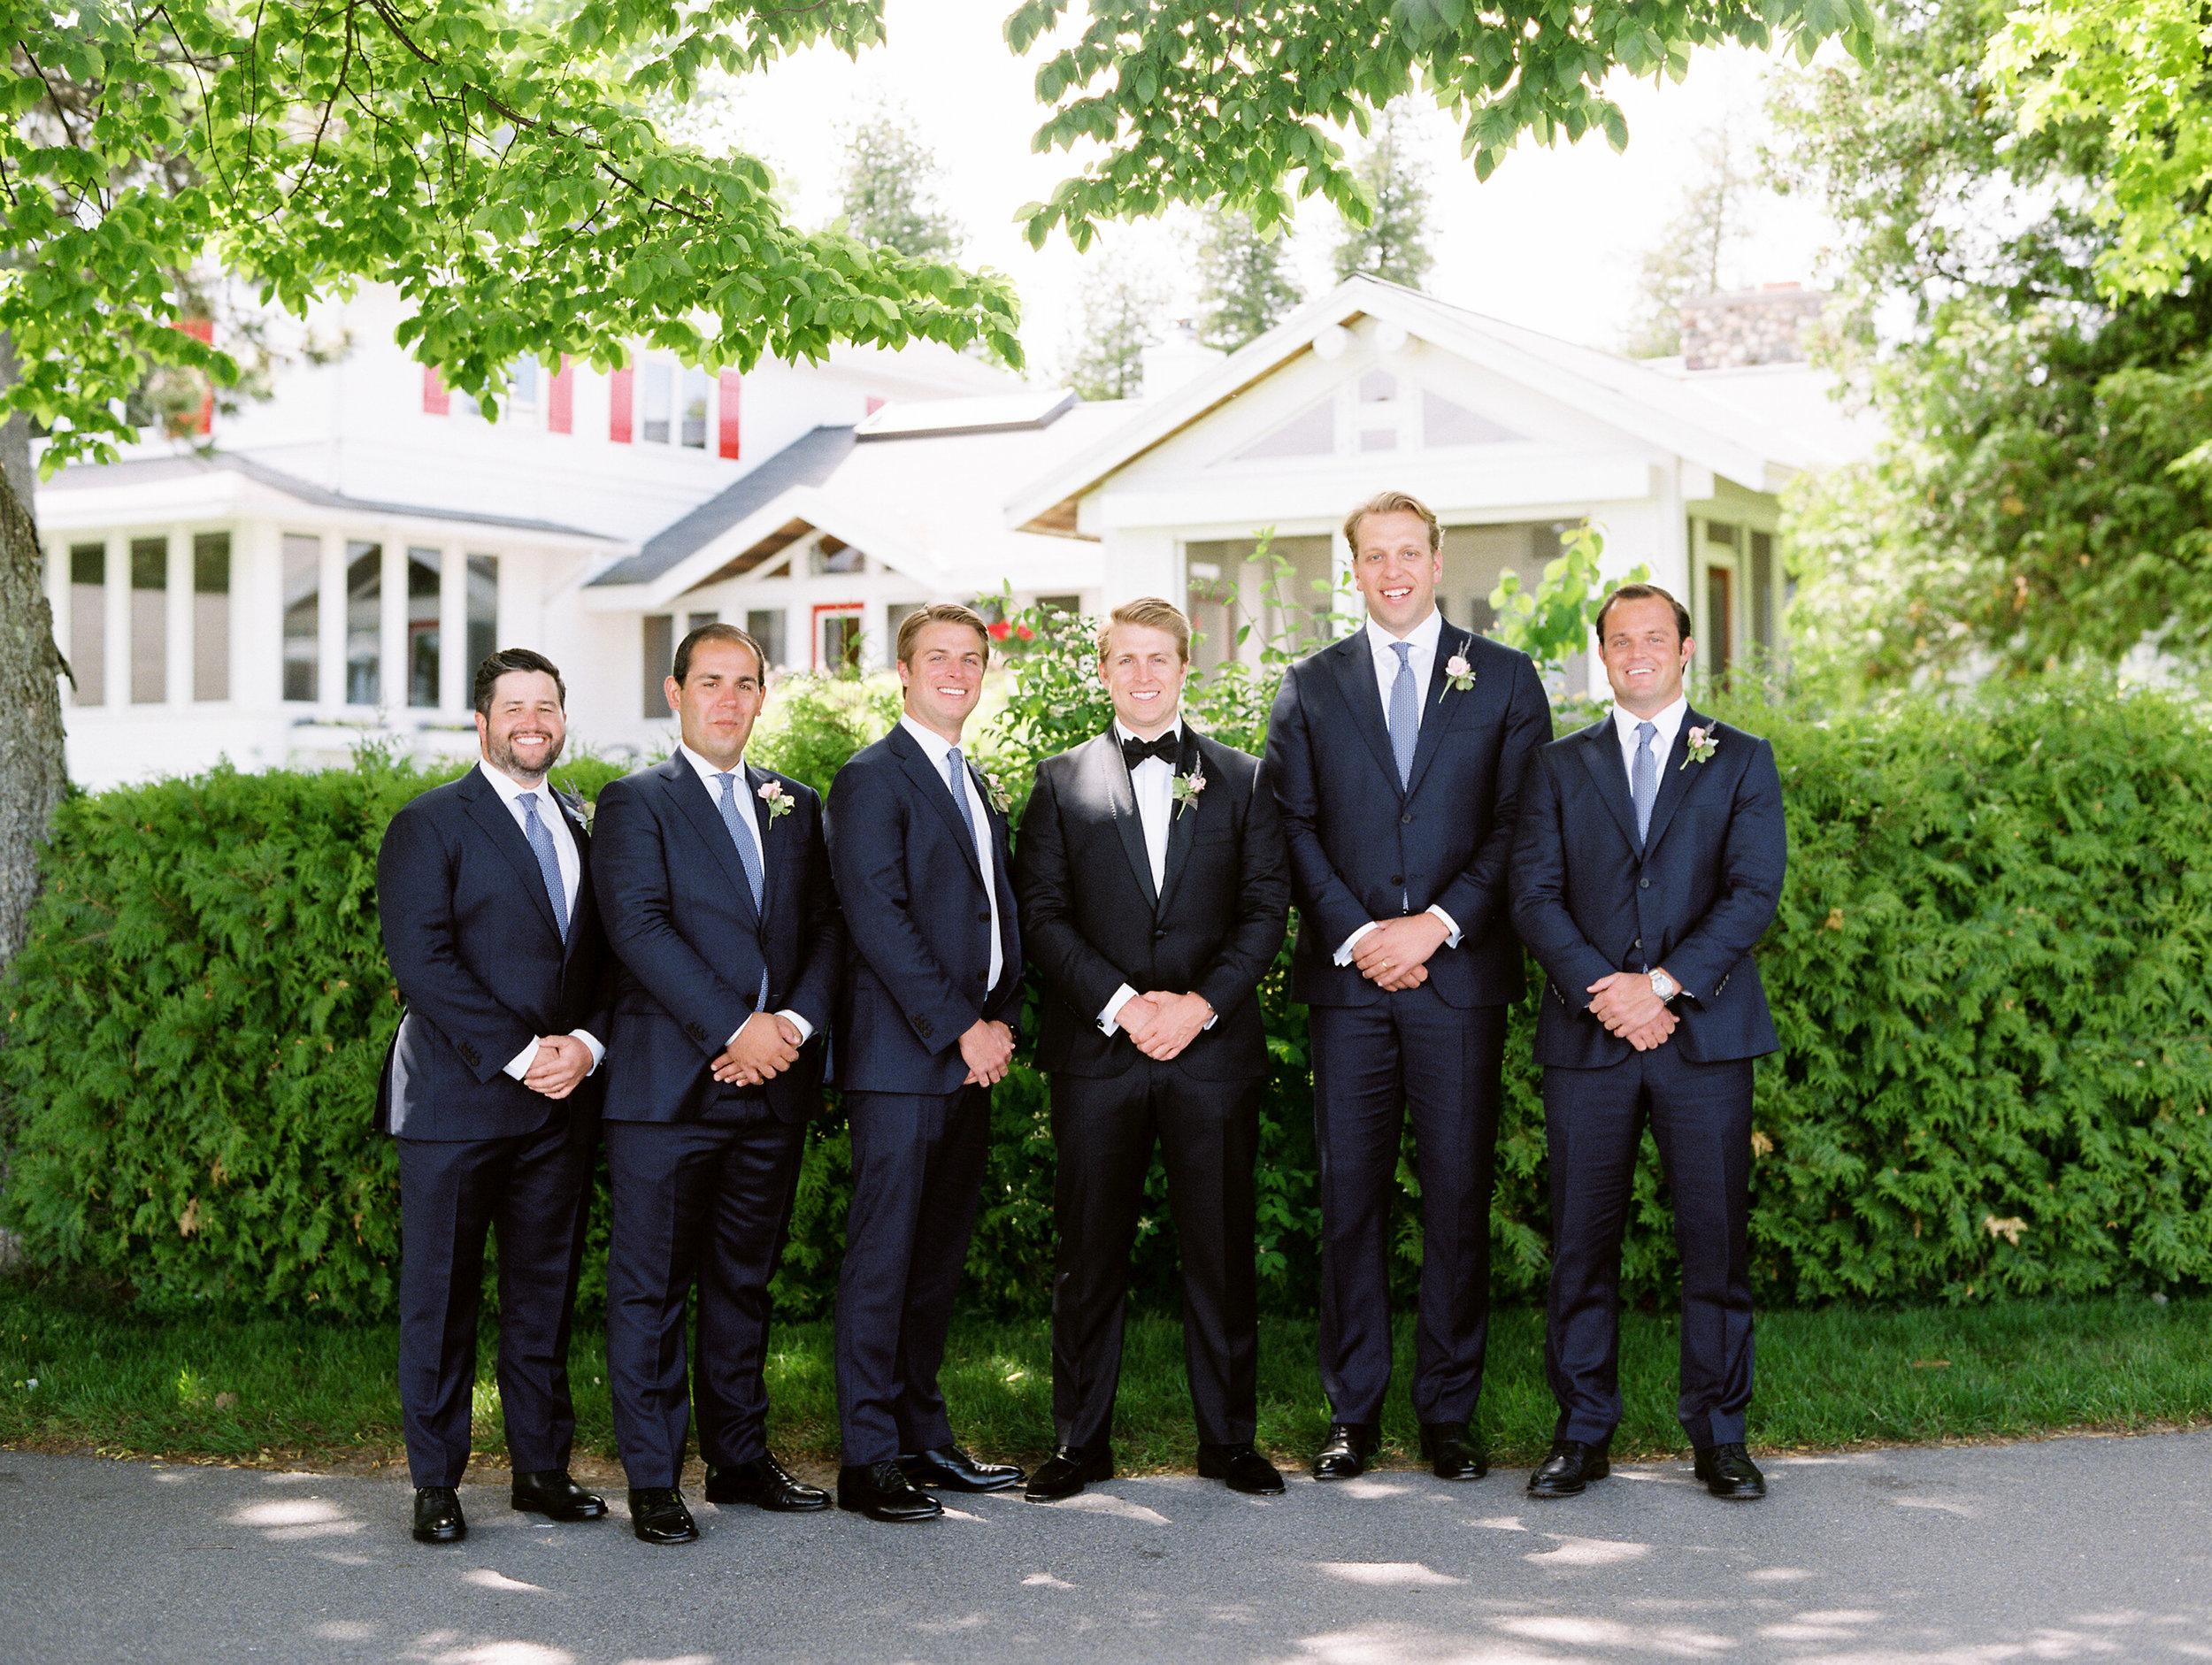 Coffman+Wedding+Bridal+Party-28.jpg